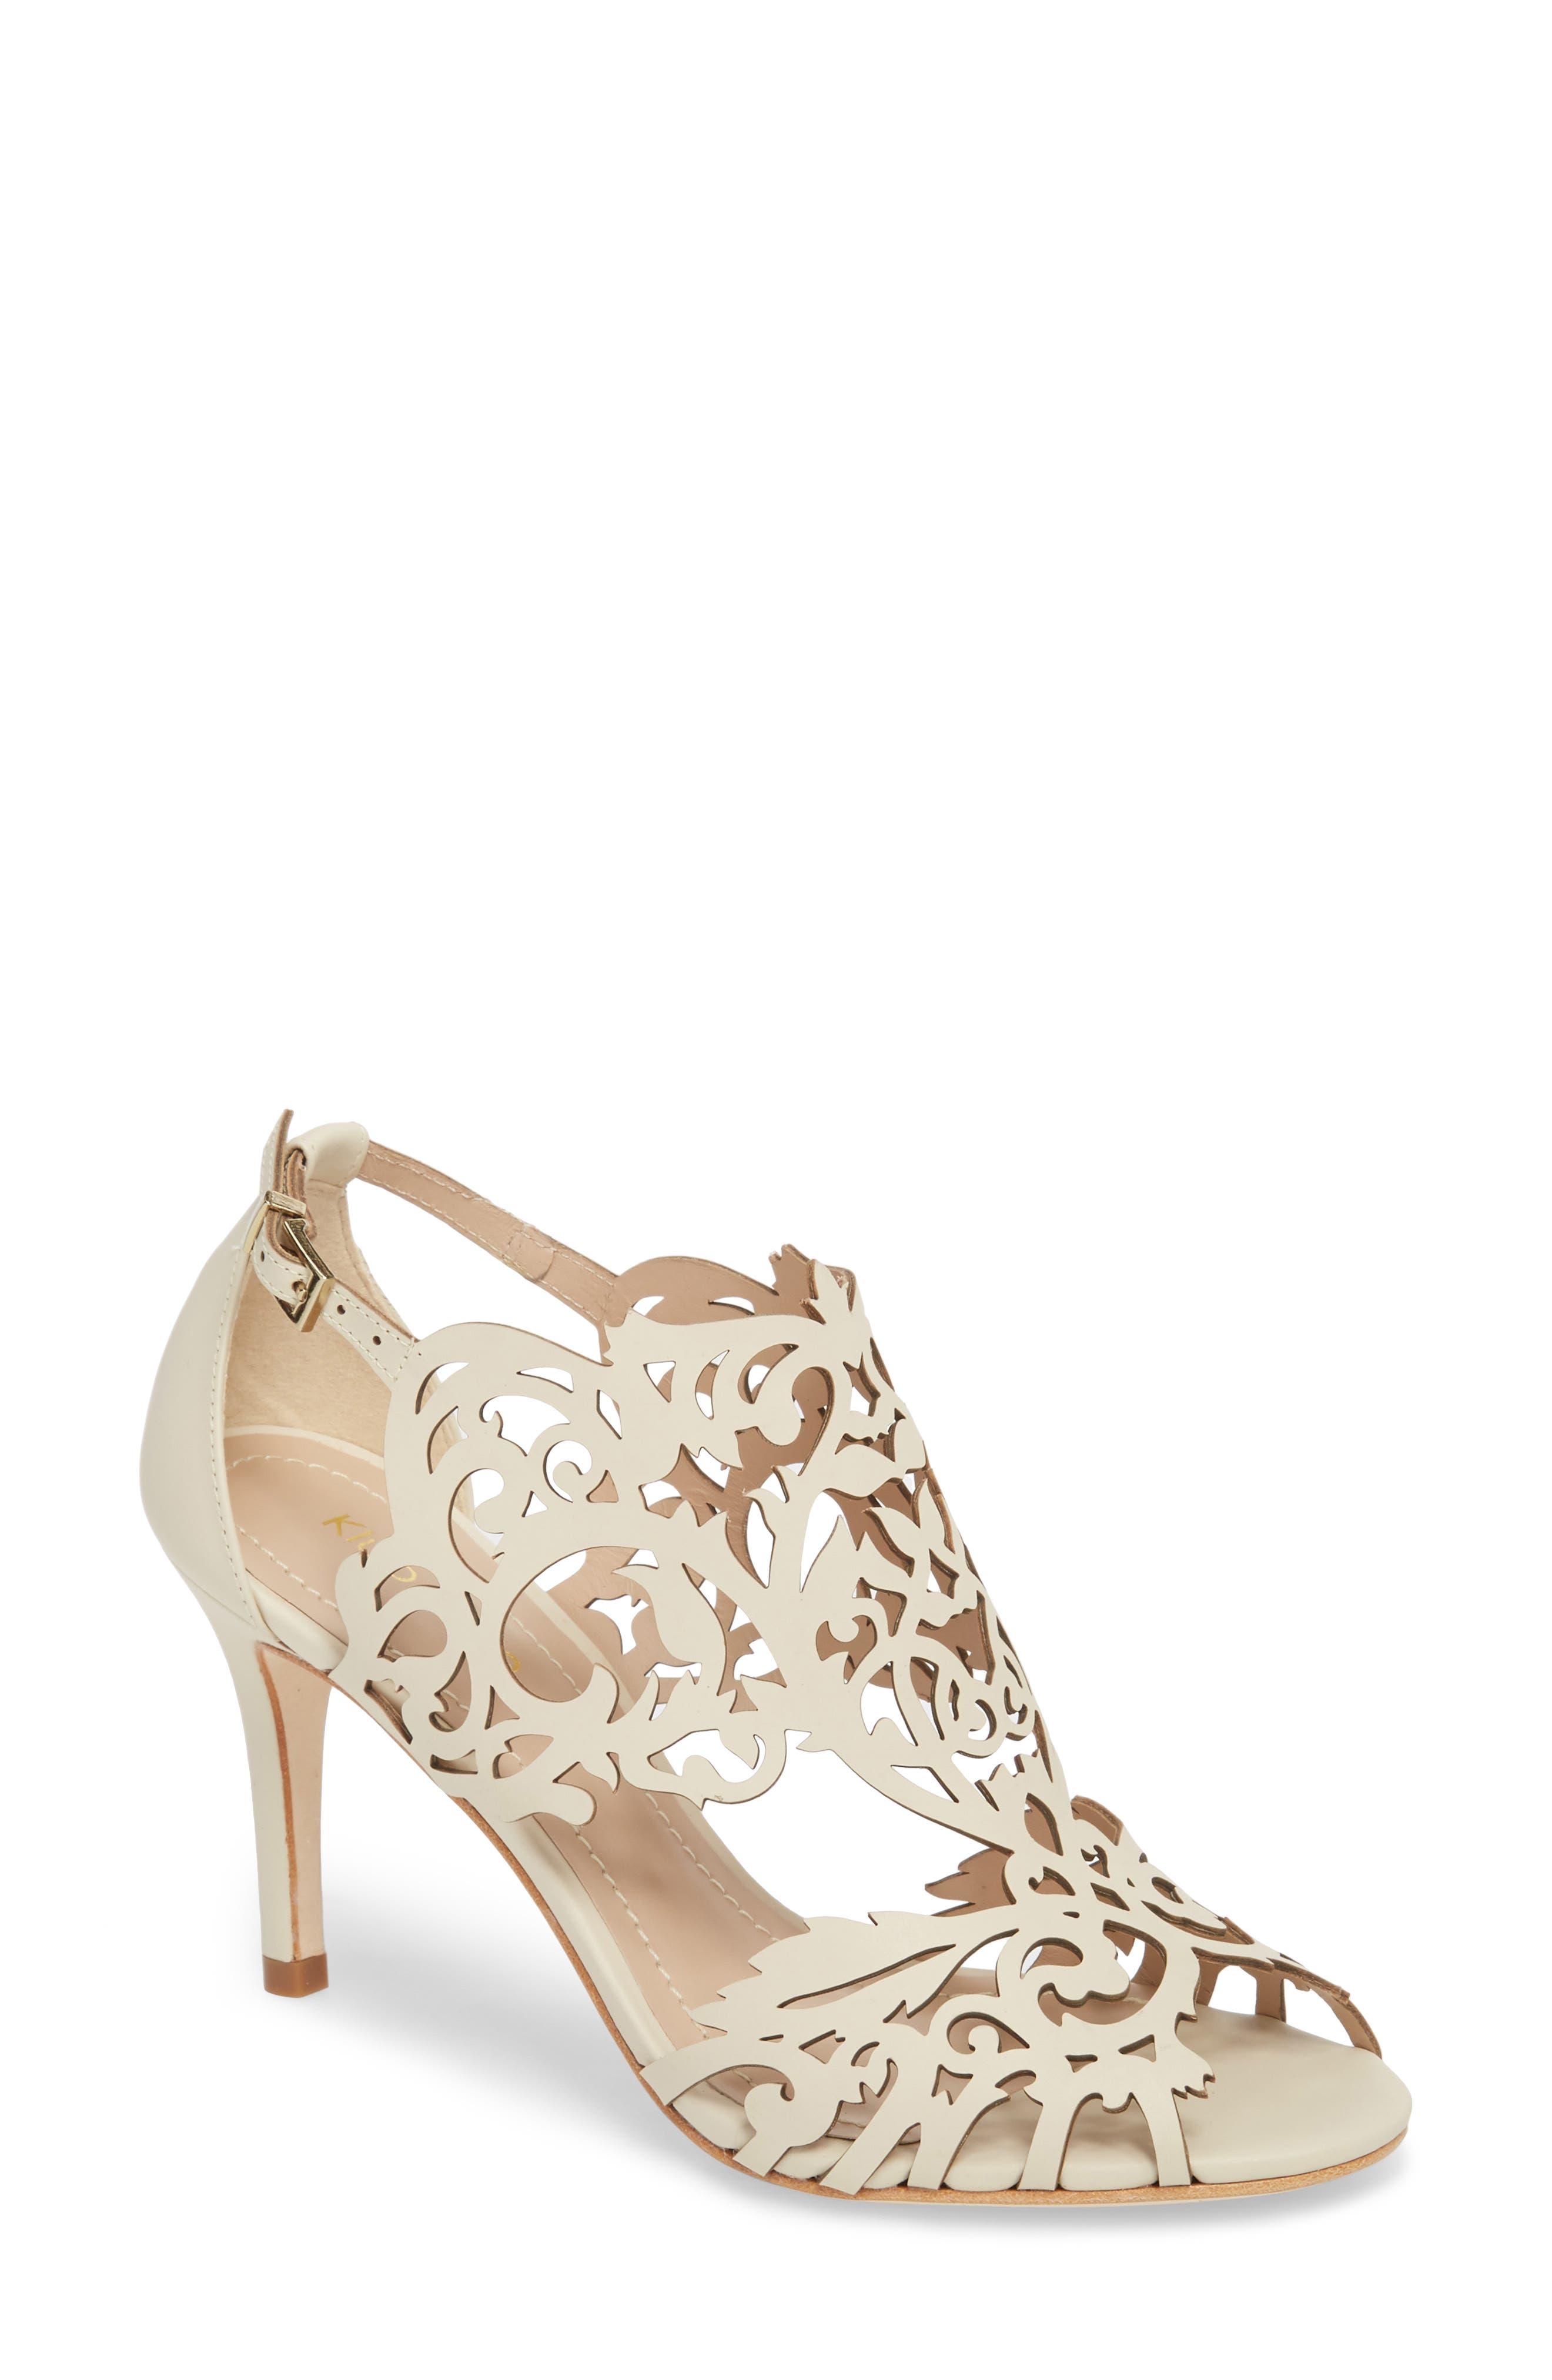 2eb09ecf351 Women's Wedding Shoes | Nordstrom